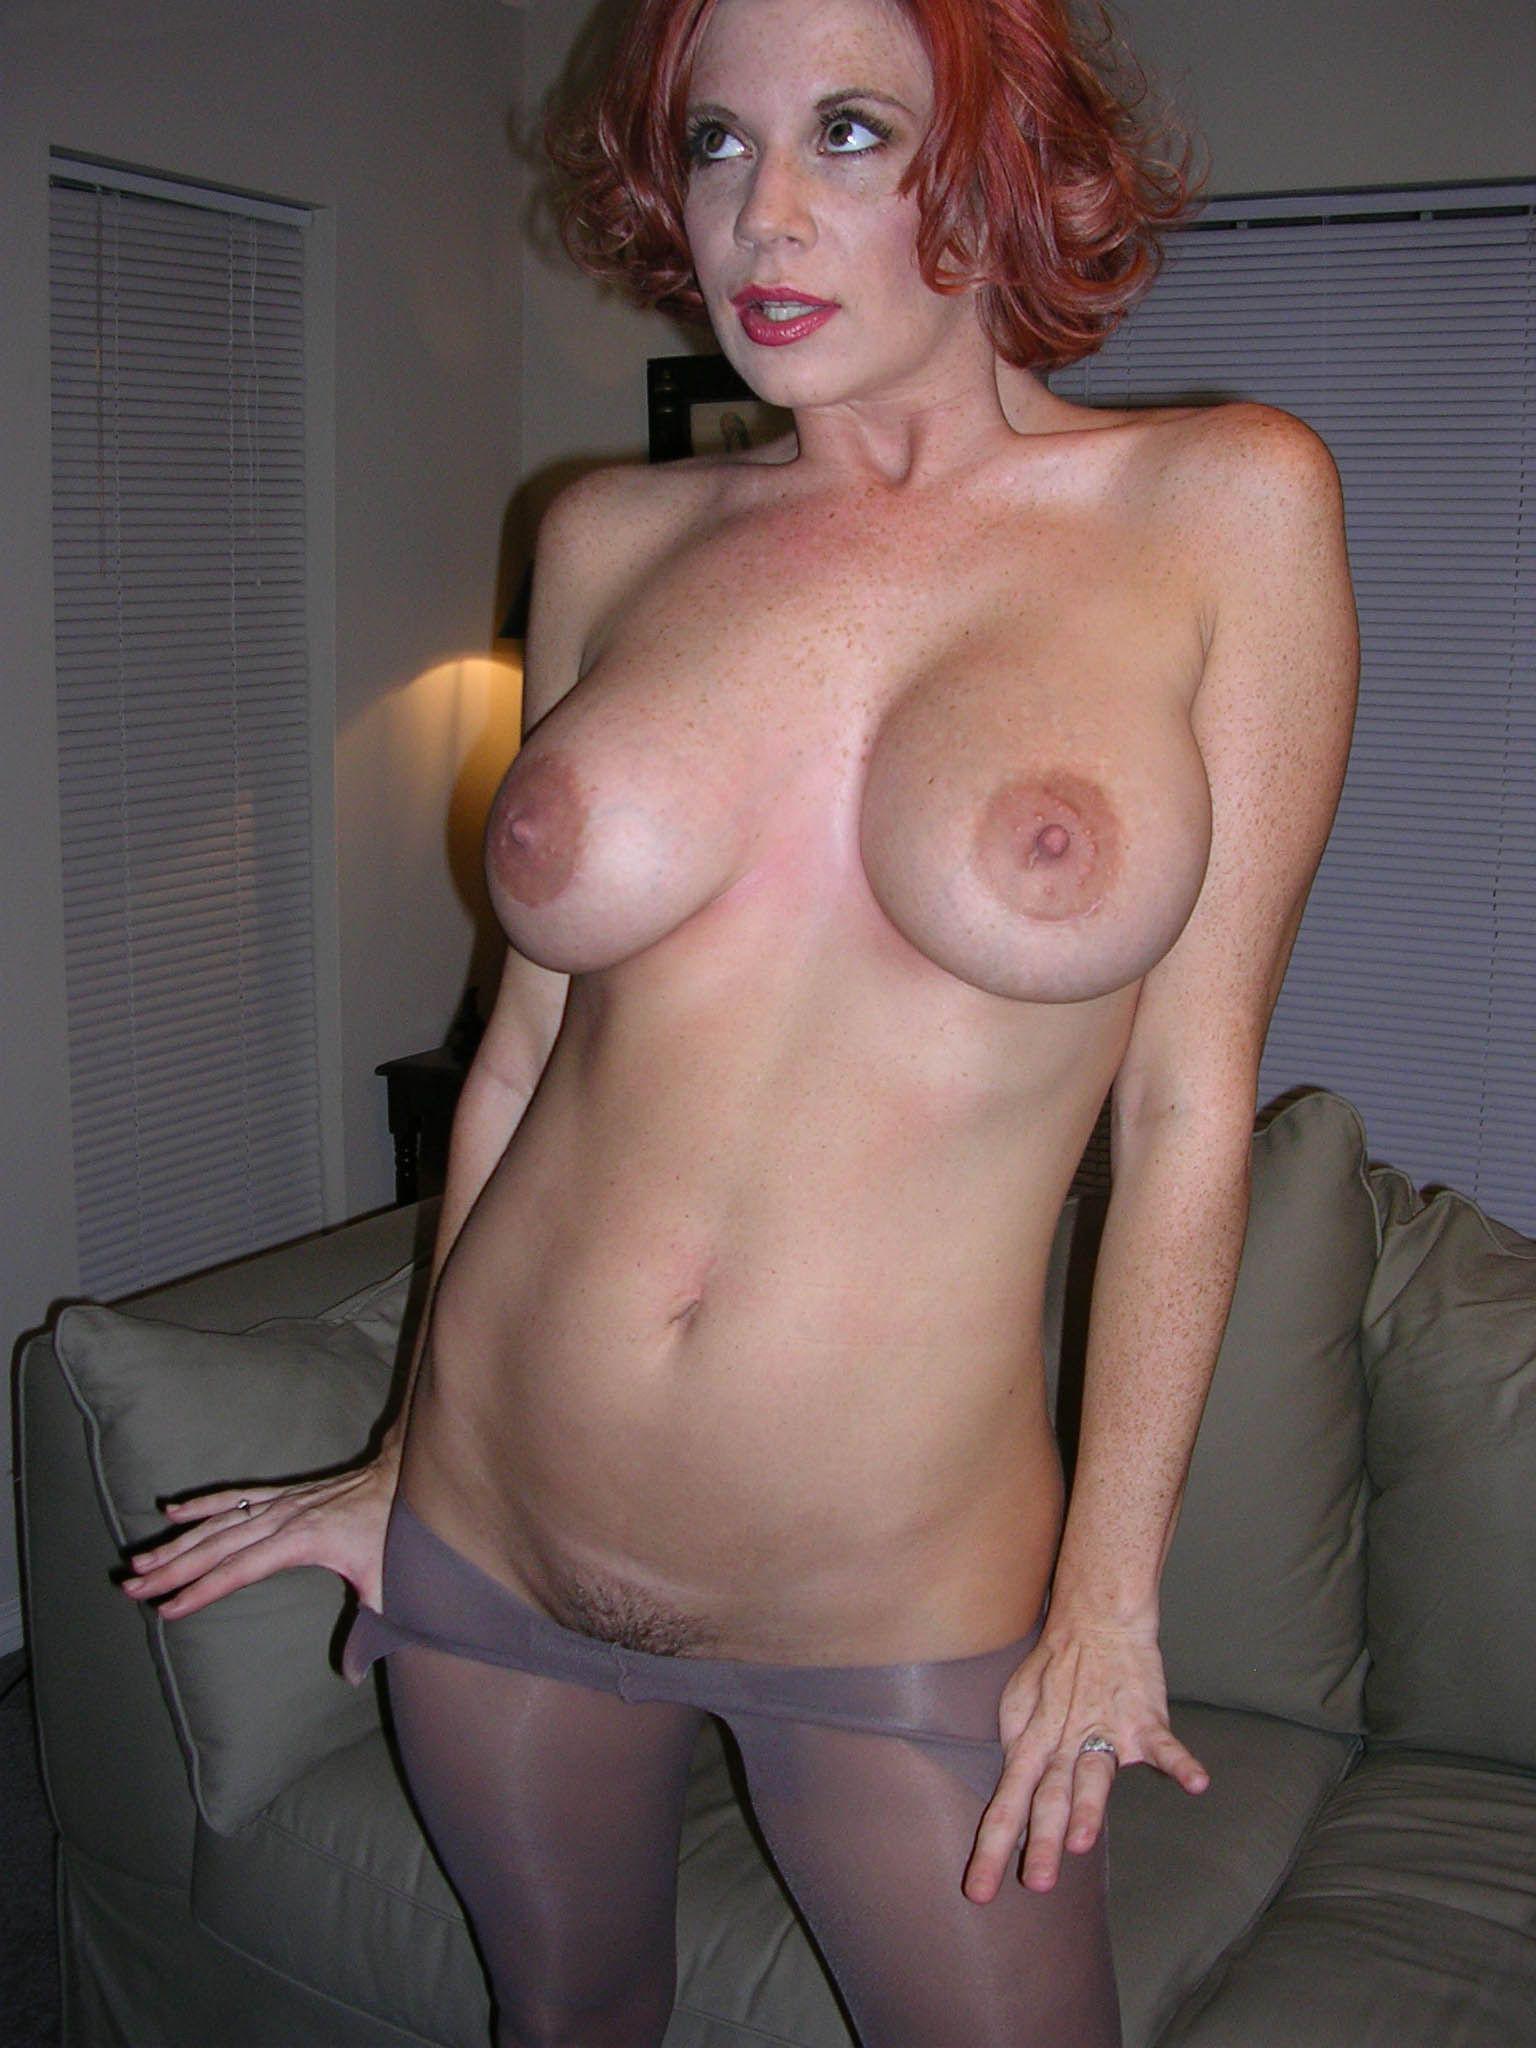 galleries-photos-of-redhead-nude-milfs